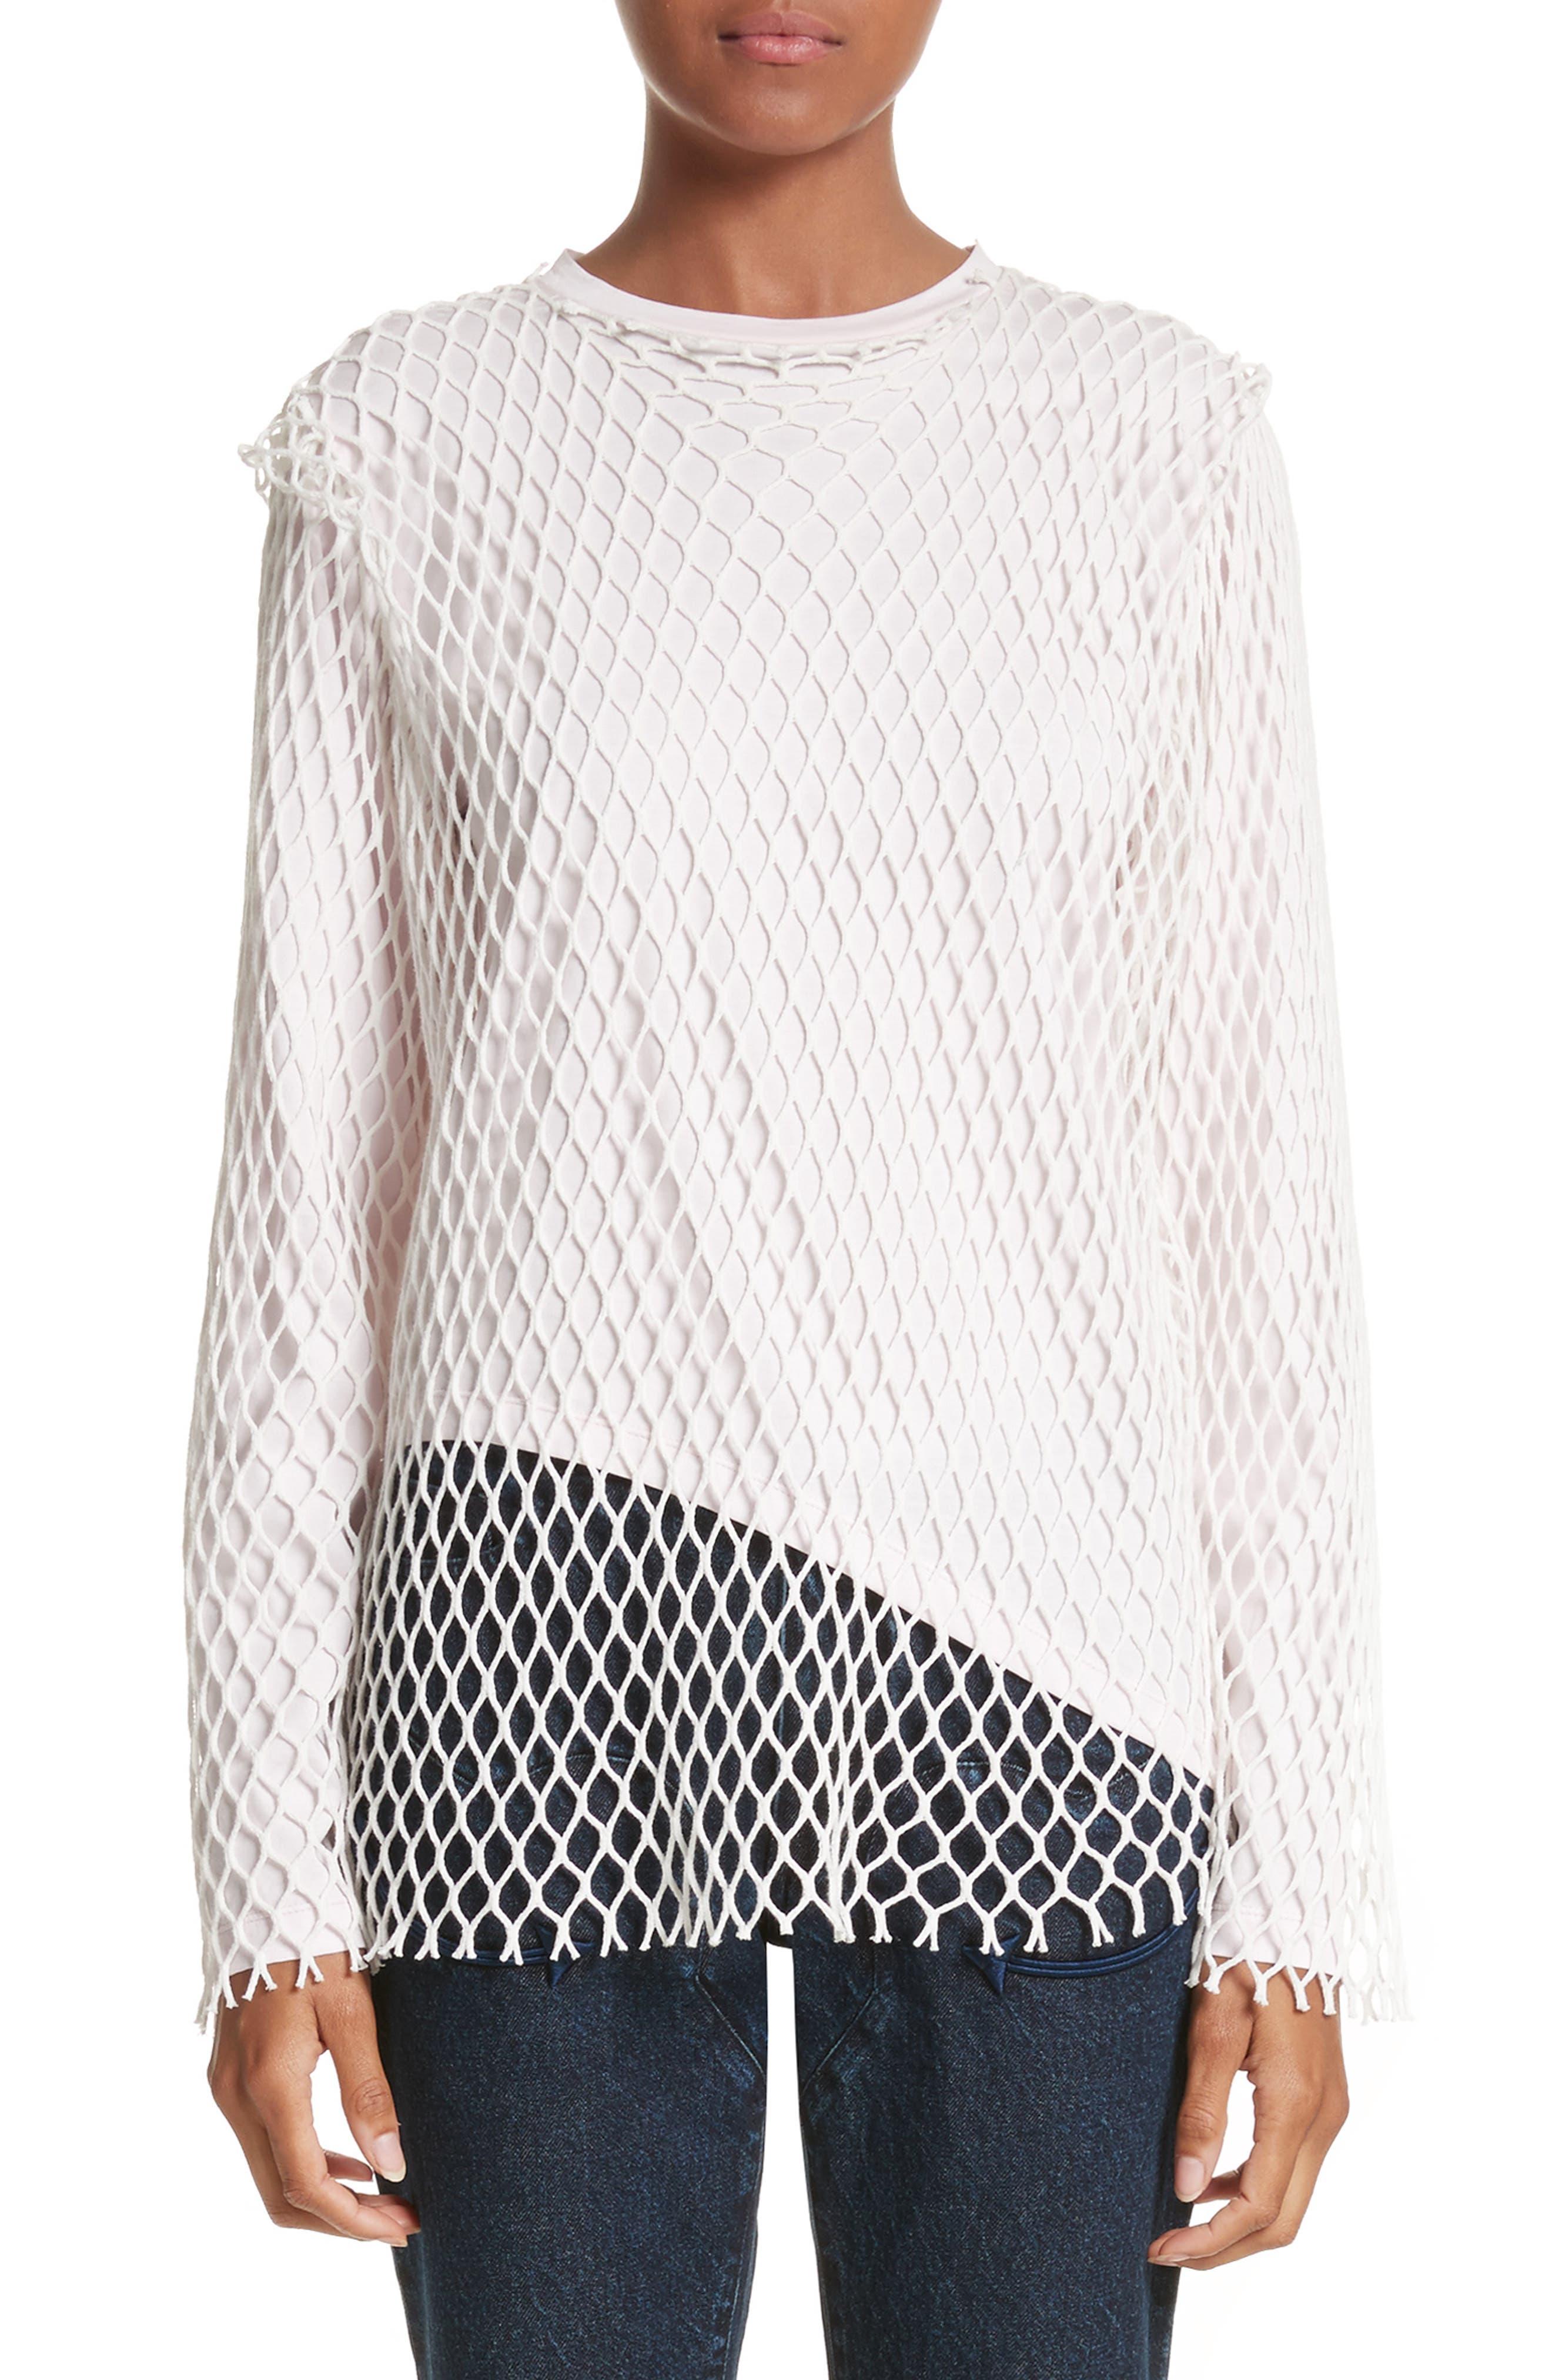 Marques'Almeida Net Jersey Top